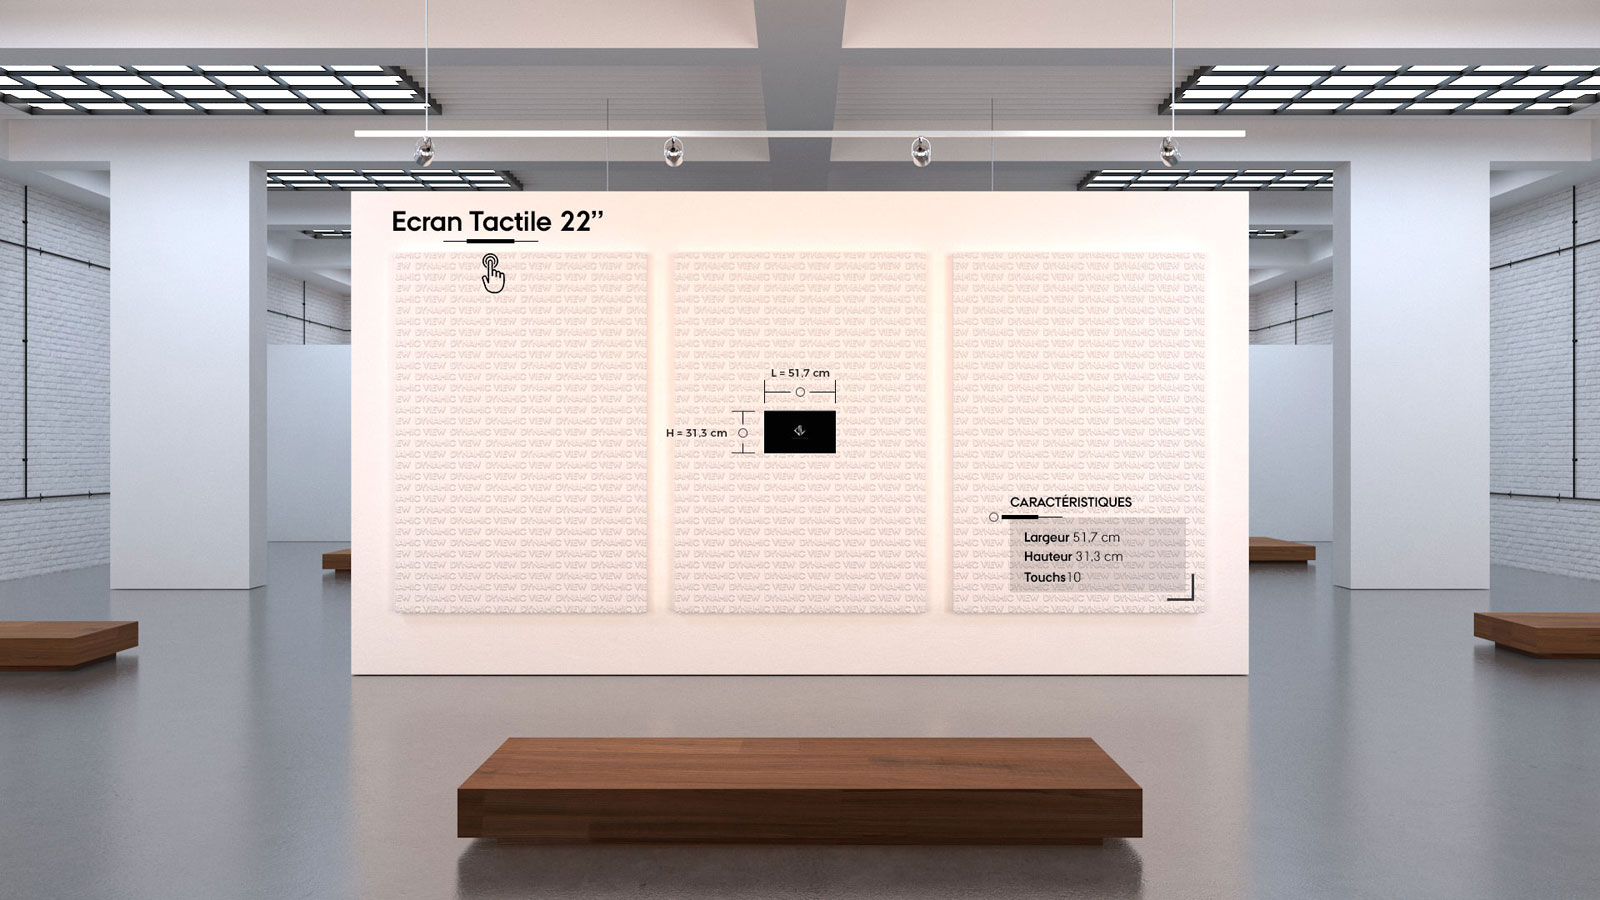 40 Ecran Tactile 22''